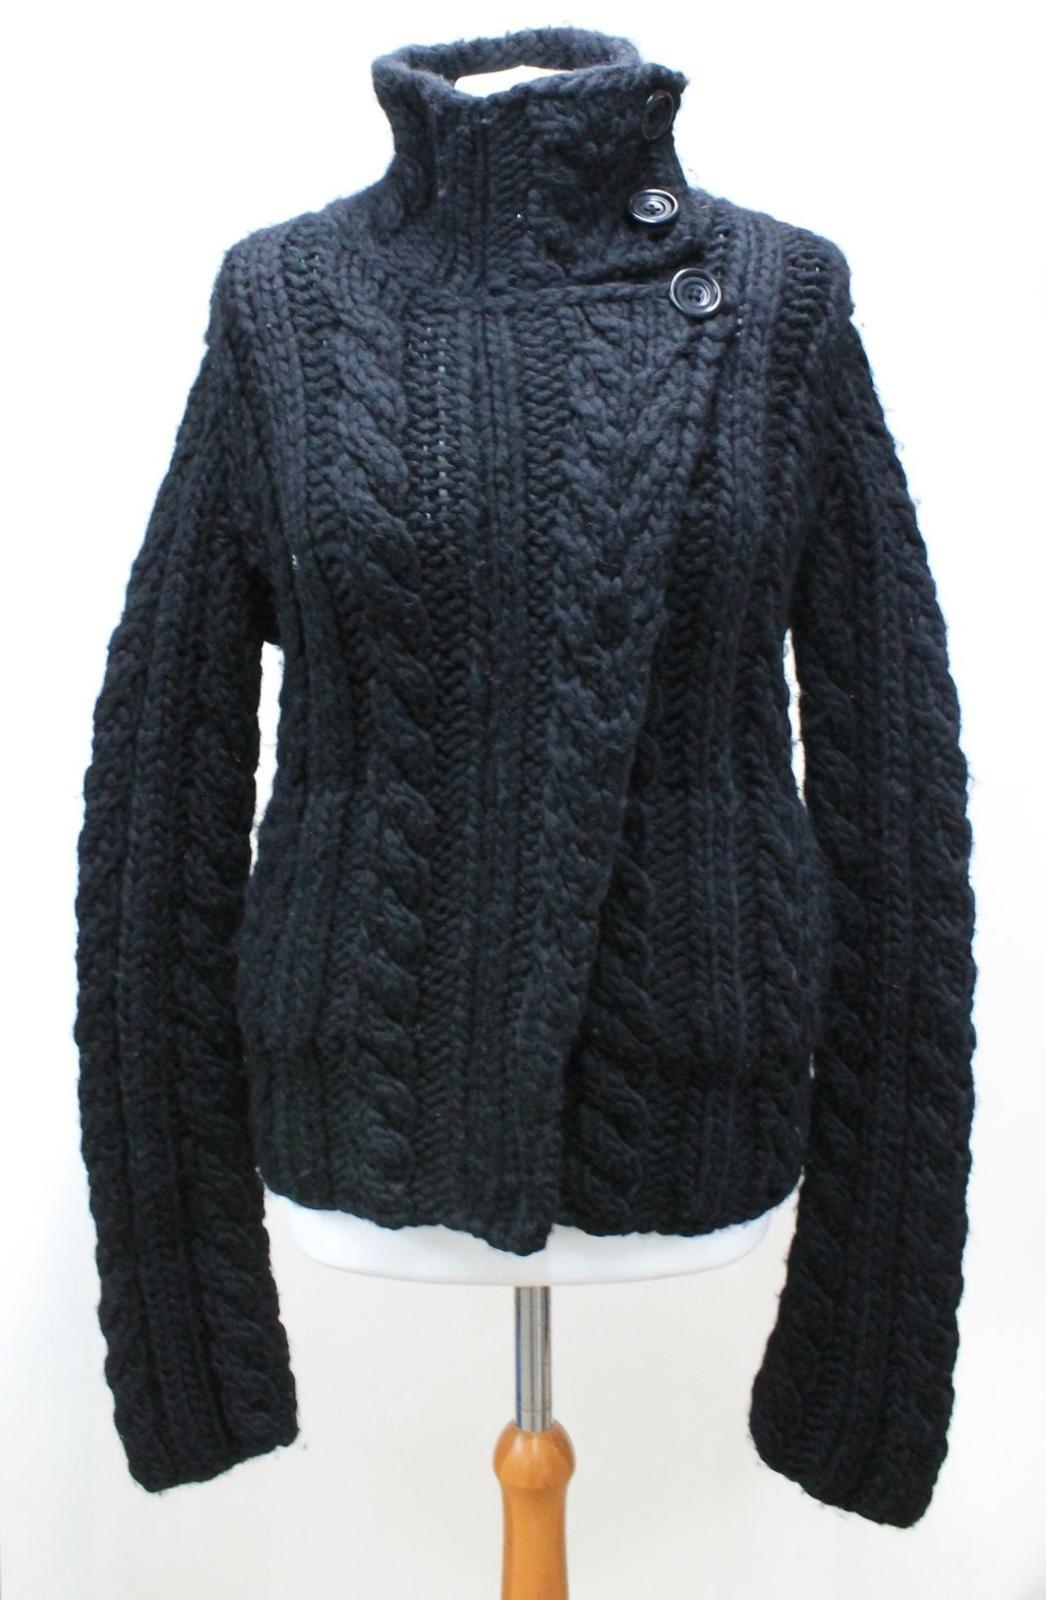 FARHI-Ladies-Black-Cable-Knit-Wool-Zip-Up-Polo-Neck-Long-Sleeved-Jacket-UK14